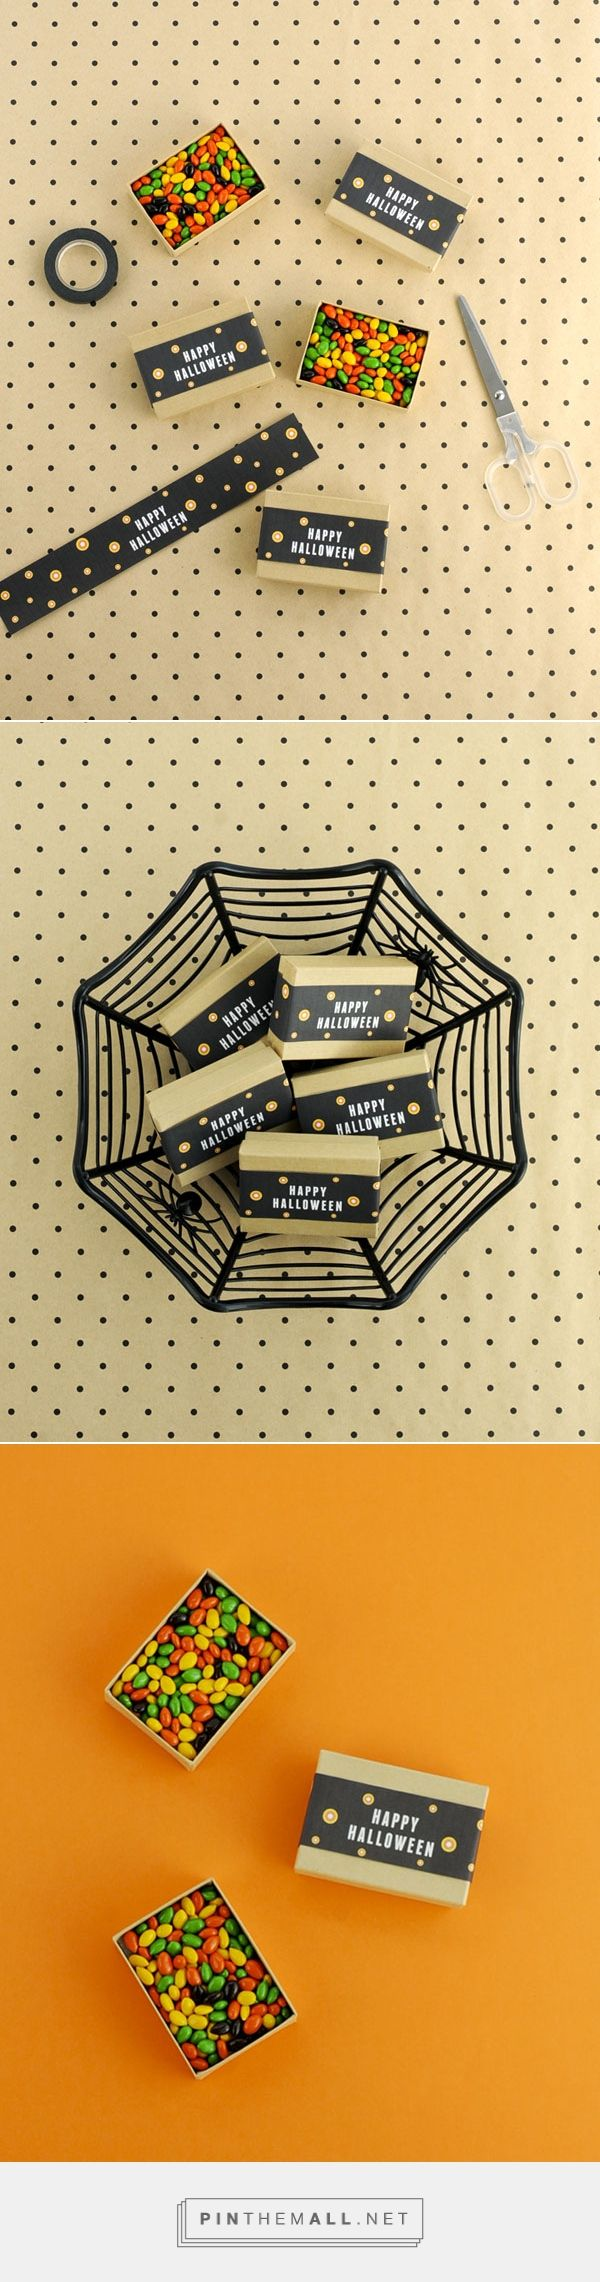 SALLY - HAPPY HALLOWEEN CANDY BOX BAND DIY